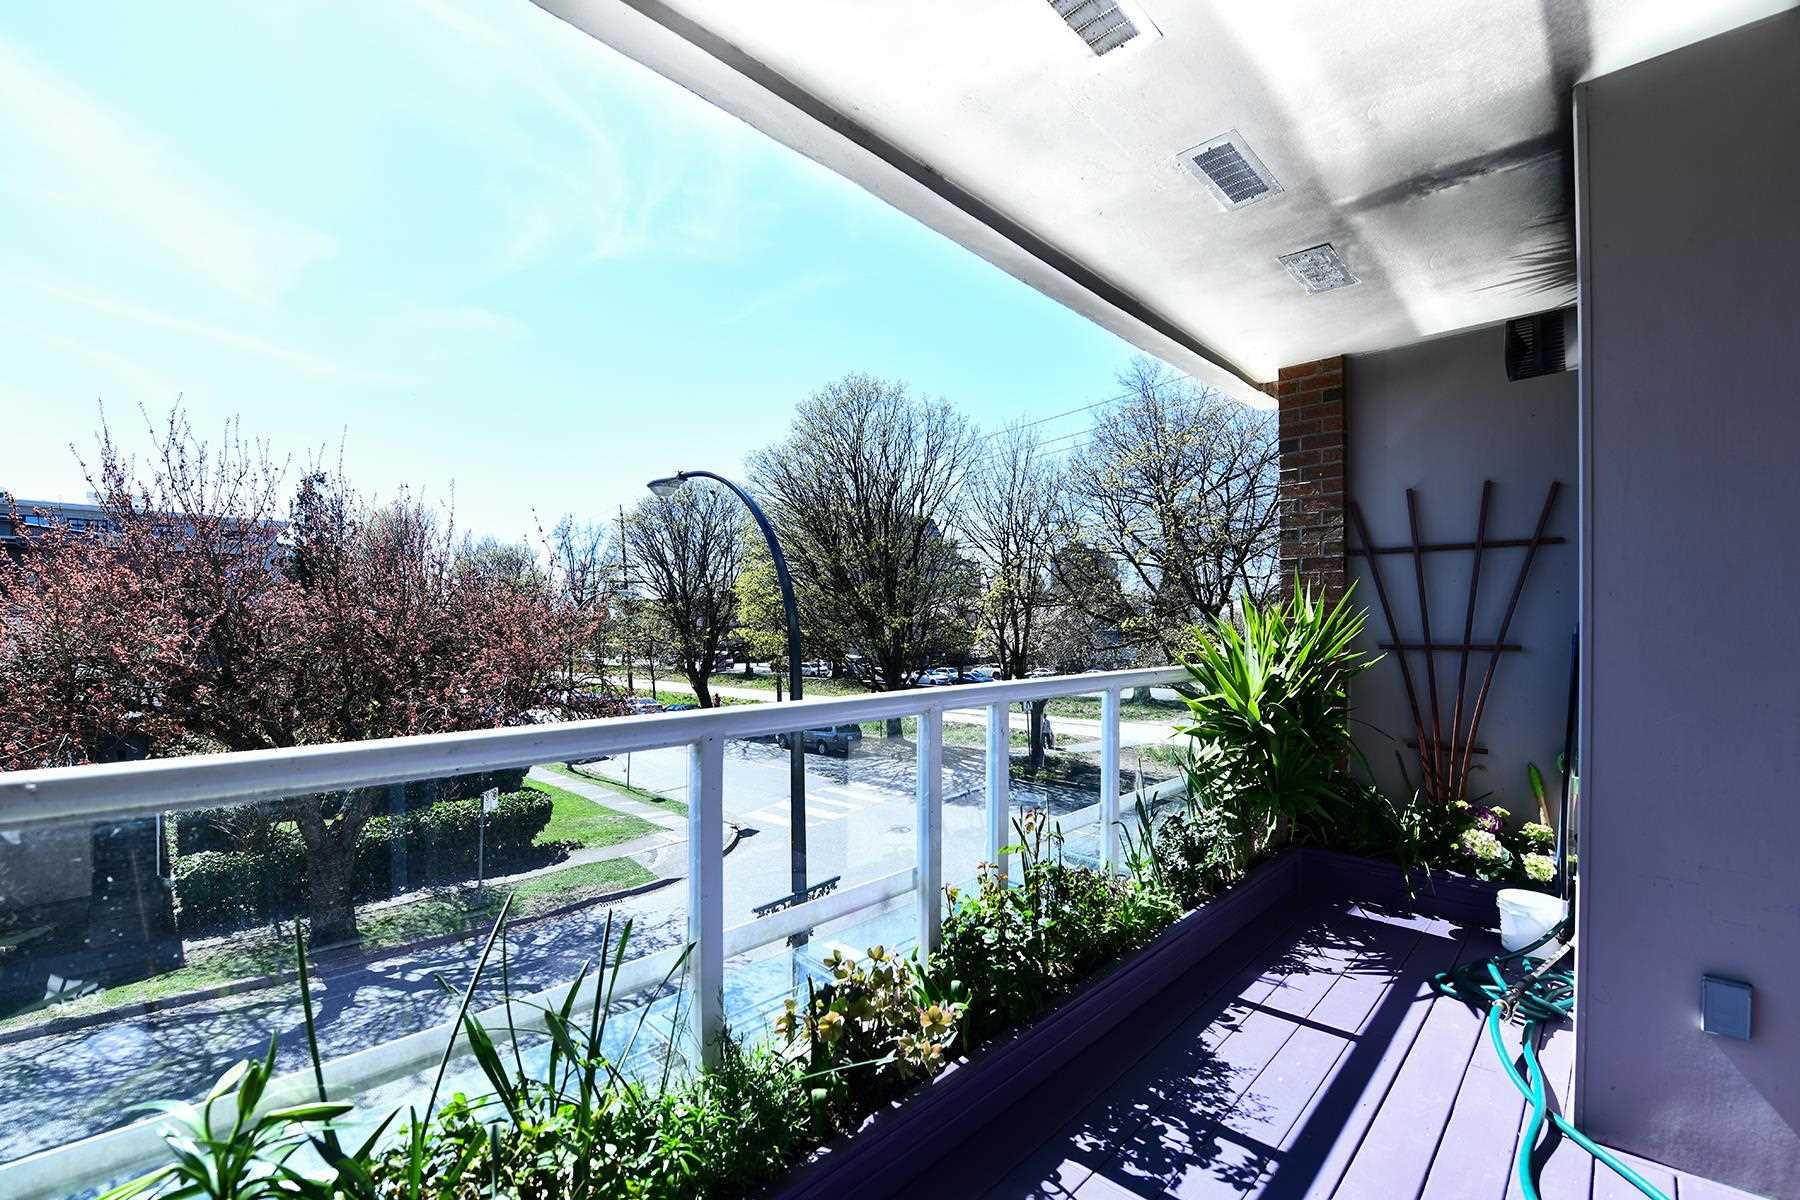 204 5790 EAST BOULEVARD - Kerrisdale Apartment/Condo for sale, 3 Bedrooms (R2604138) - #22